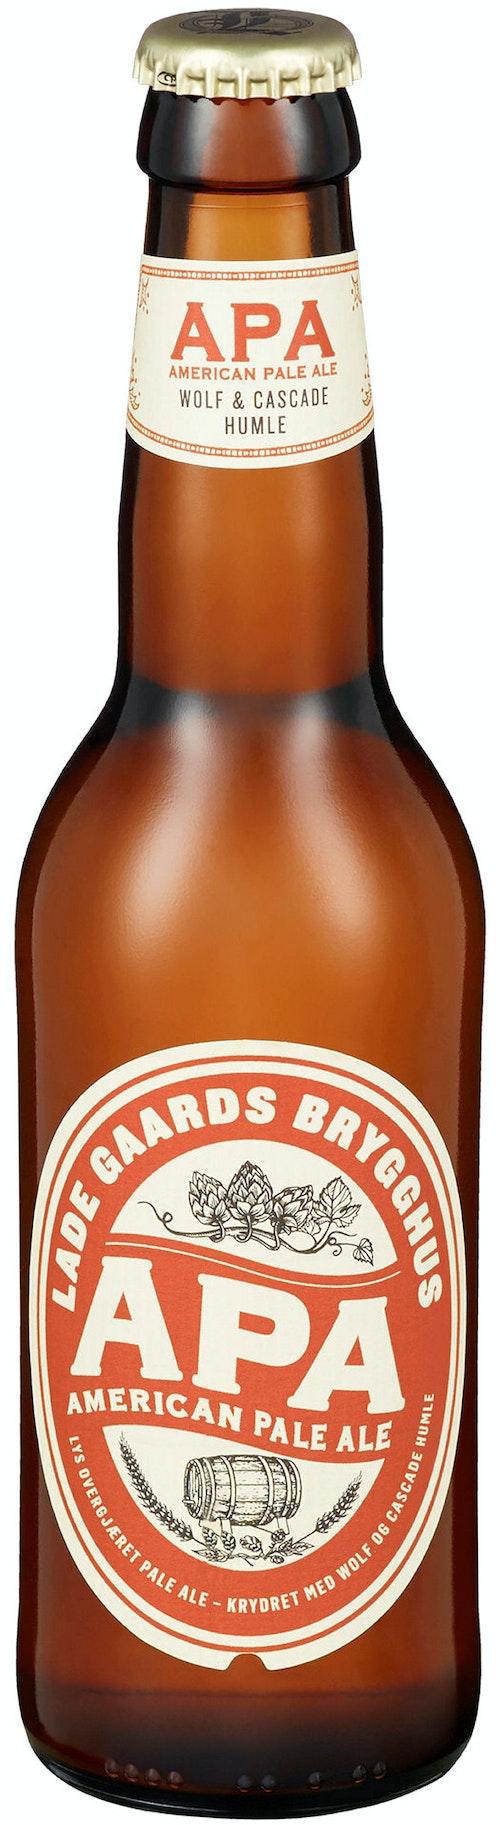 Lade Gaard Pale Ale 0,33 l